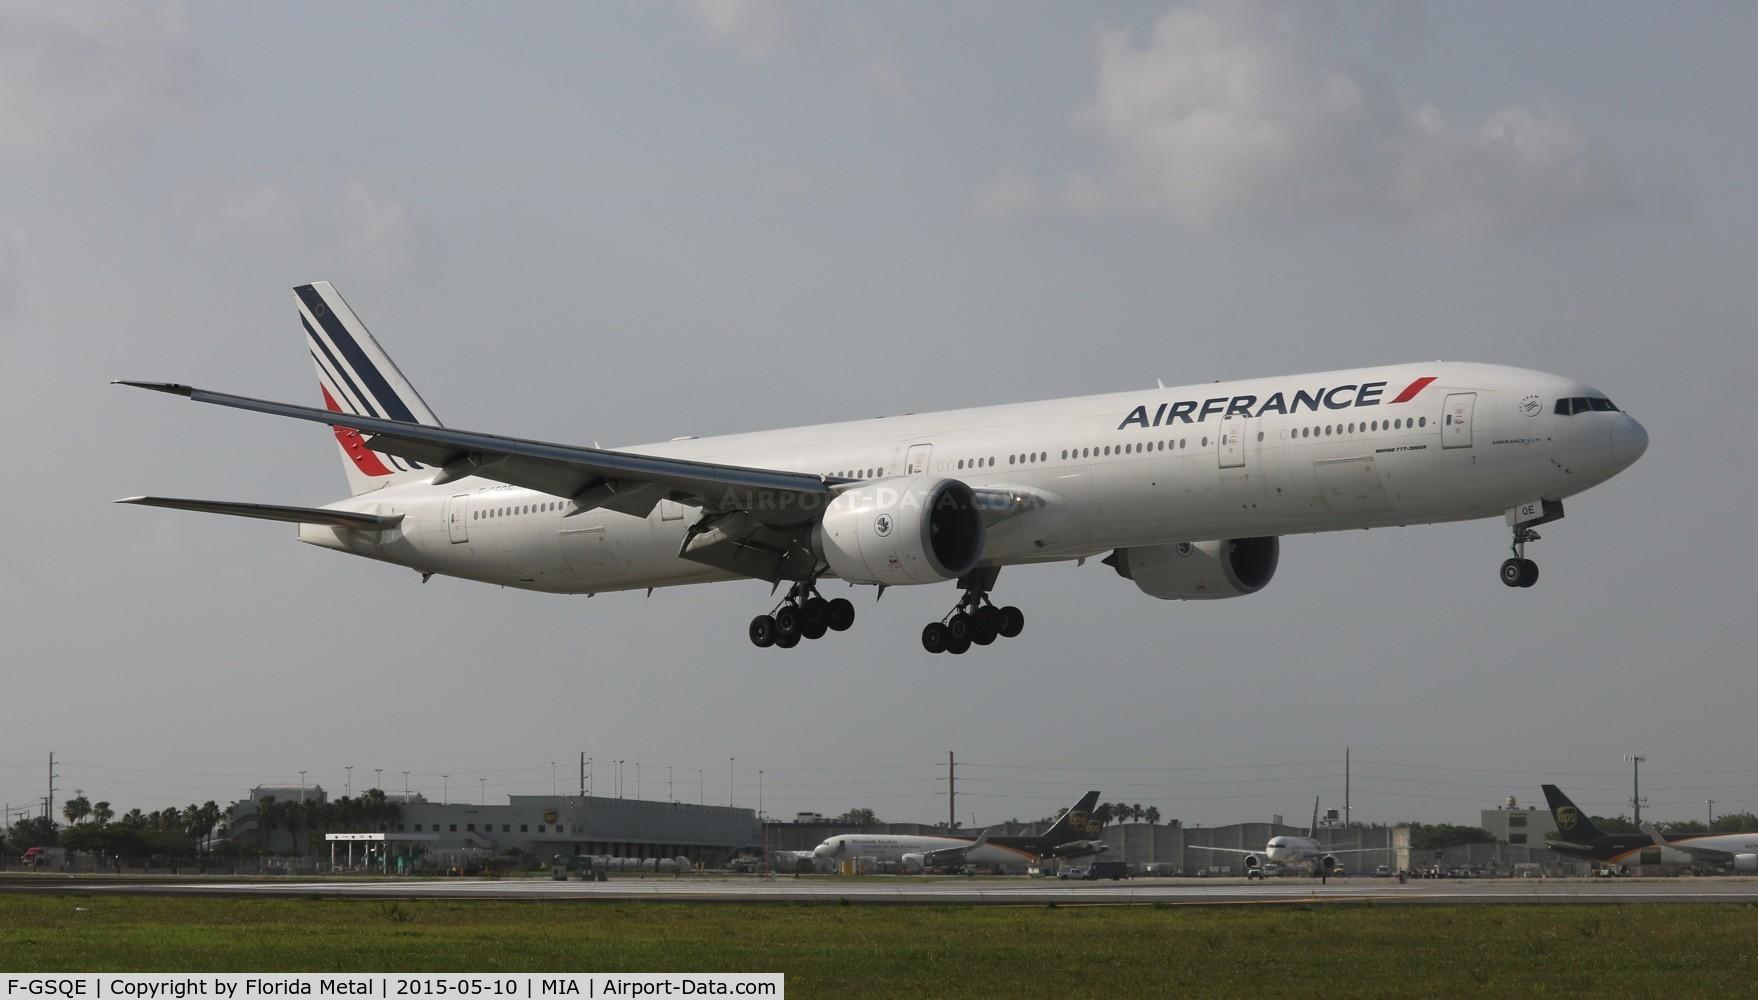 F-GSQE, 2004 Boeing 777-328/ER C/N 32851, Air France